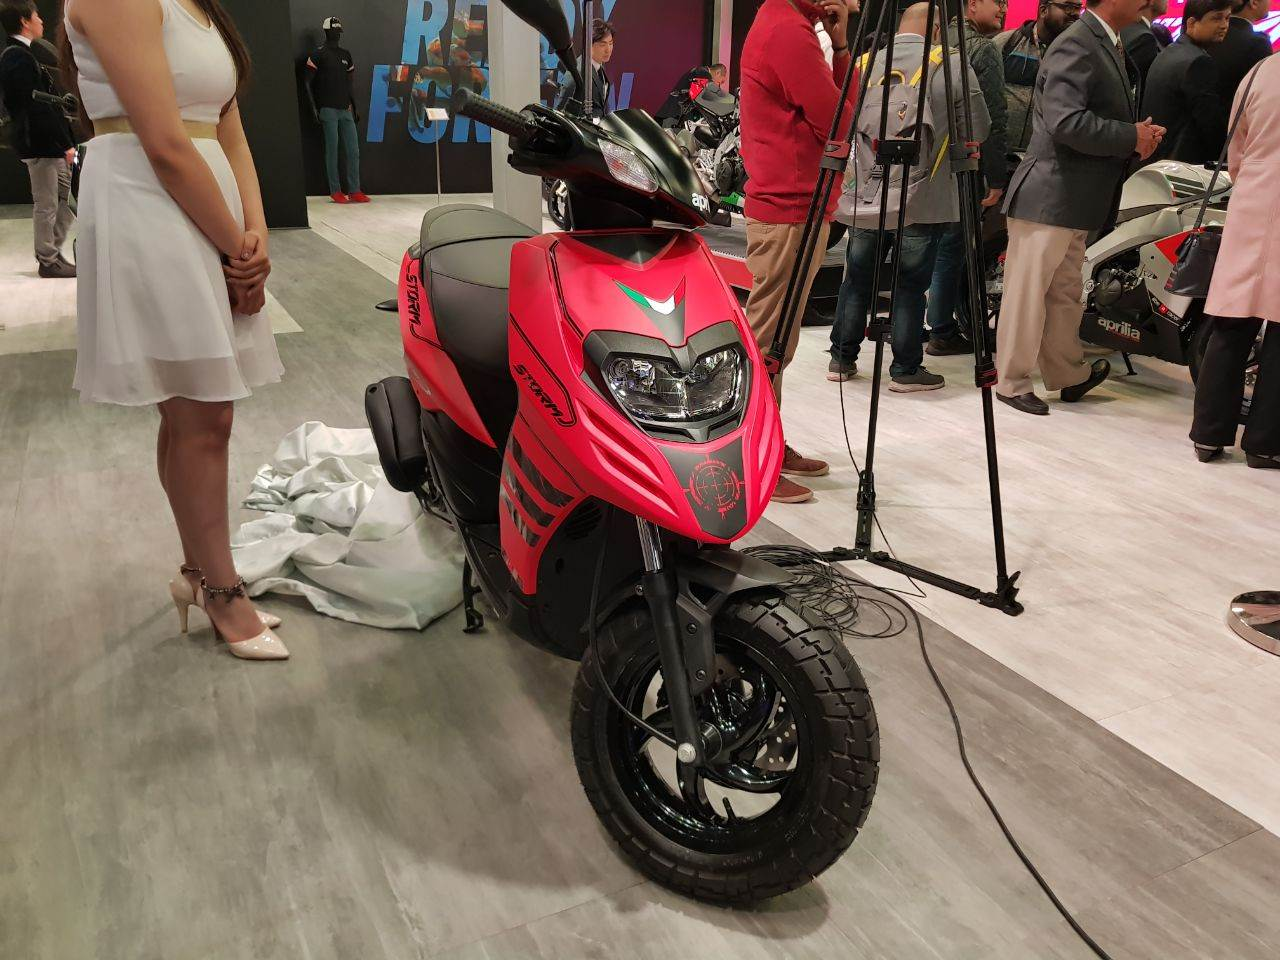 Aprilia Storm 125 revealed at Auto Expo 2018